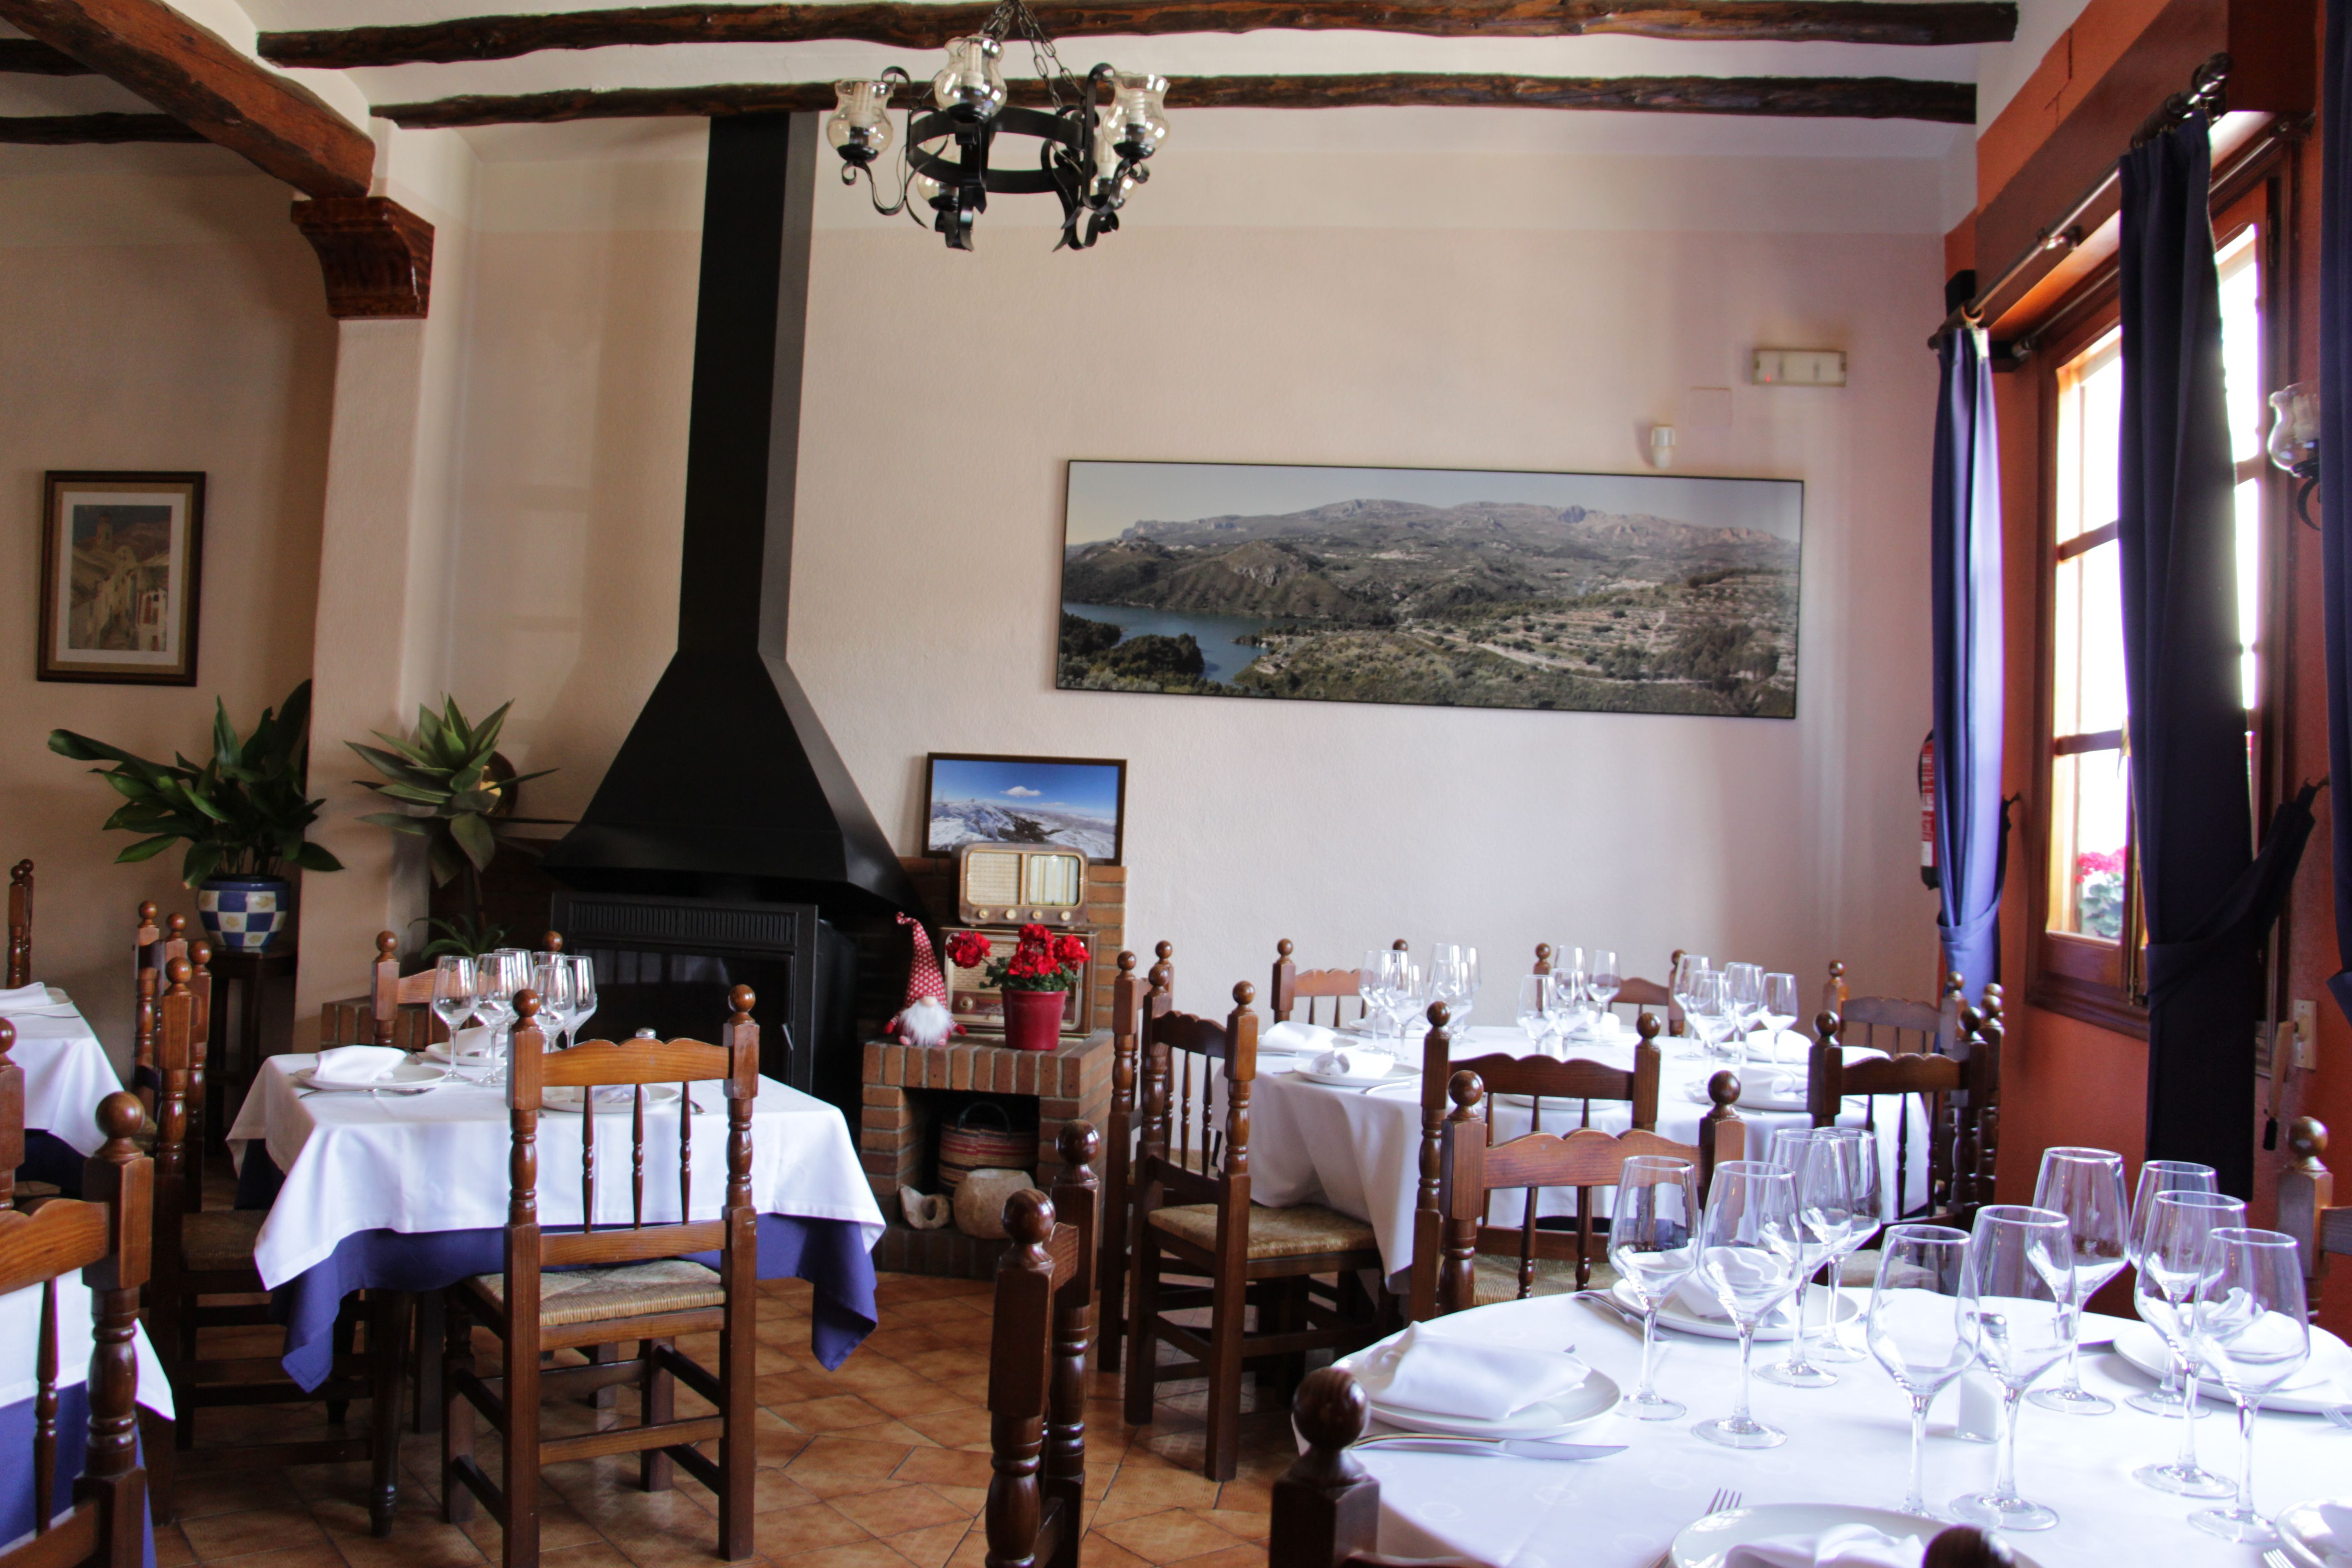 Foto 14 de Mesón - restaurante en Benimantell | Mesón Ca Rafel